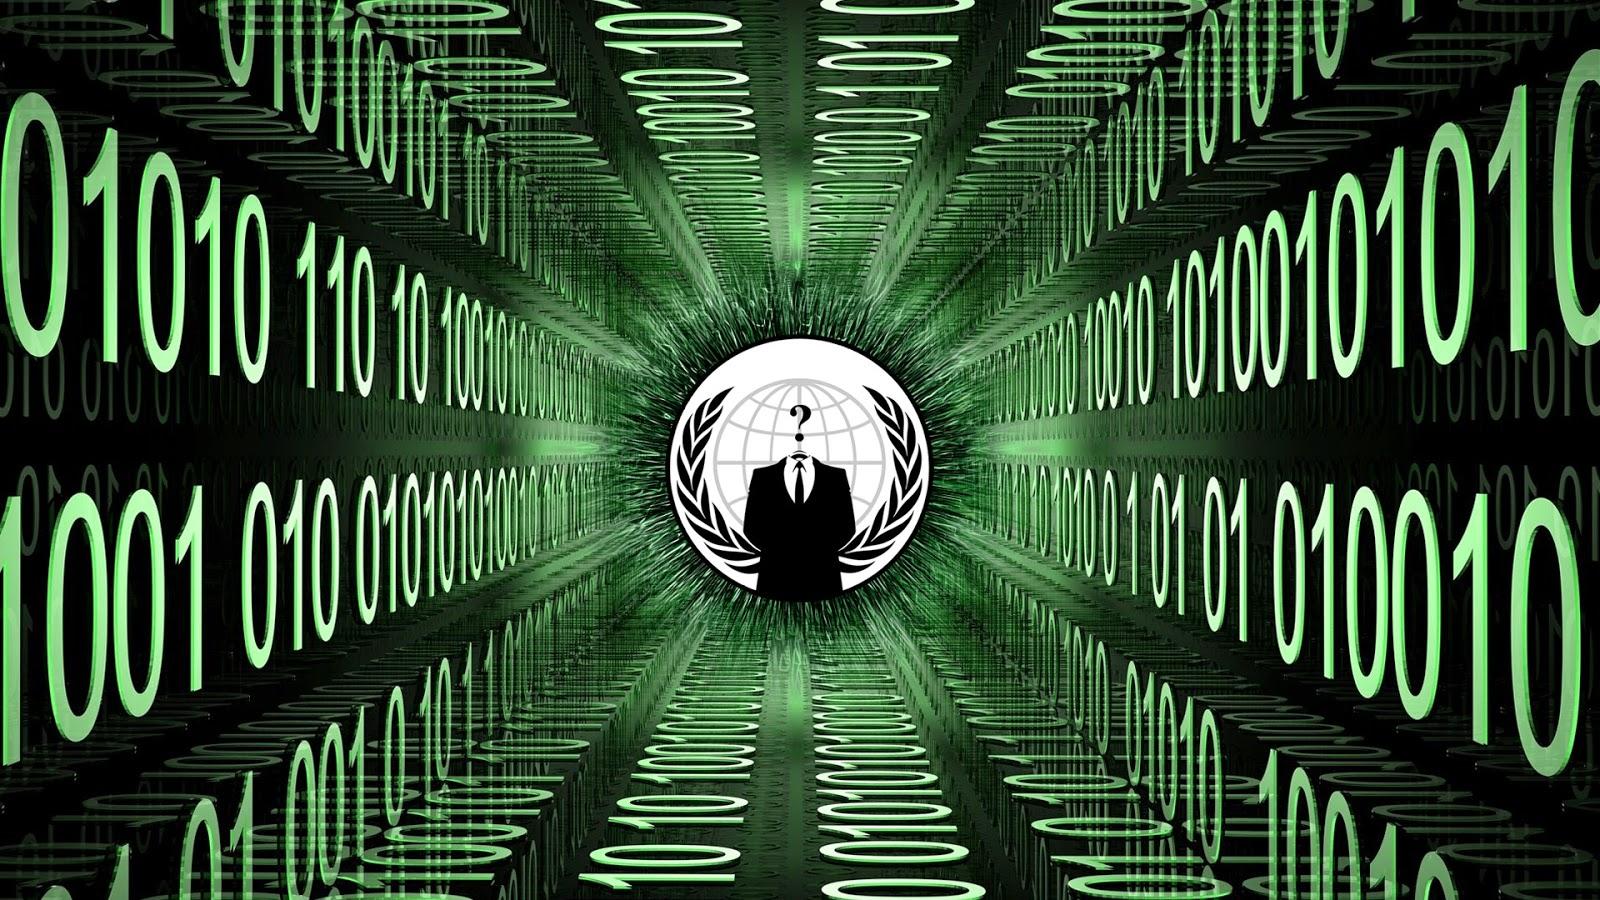 hackers wallpaper hdpcbots - part-x ~ pcbots labs (blog)